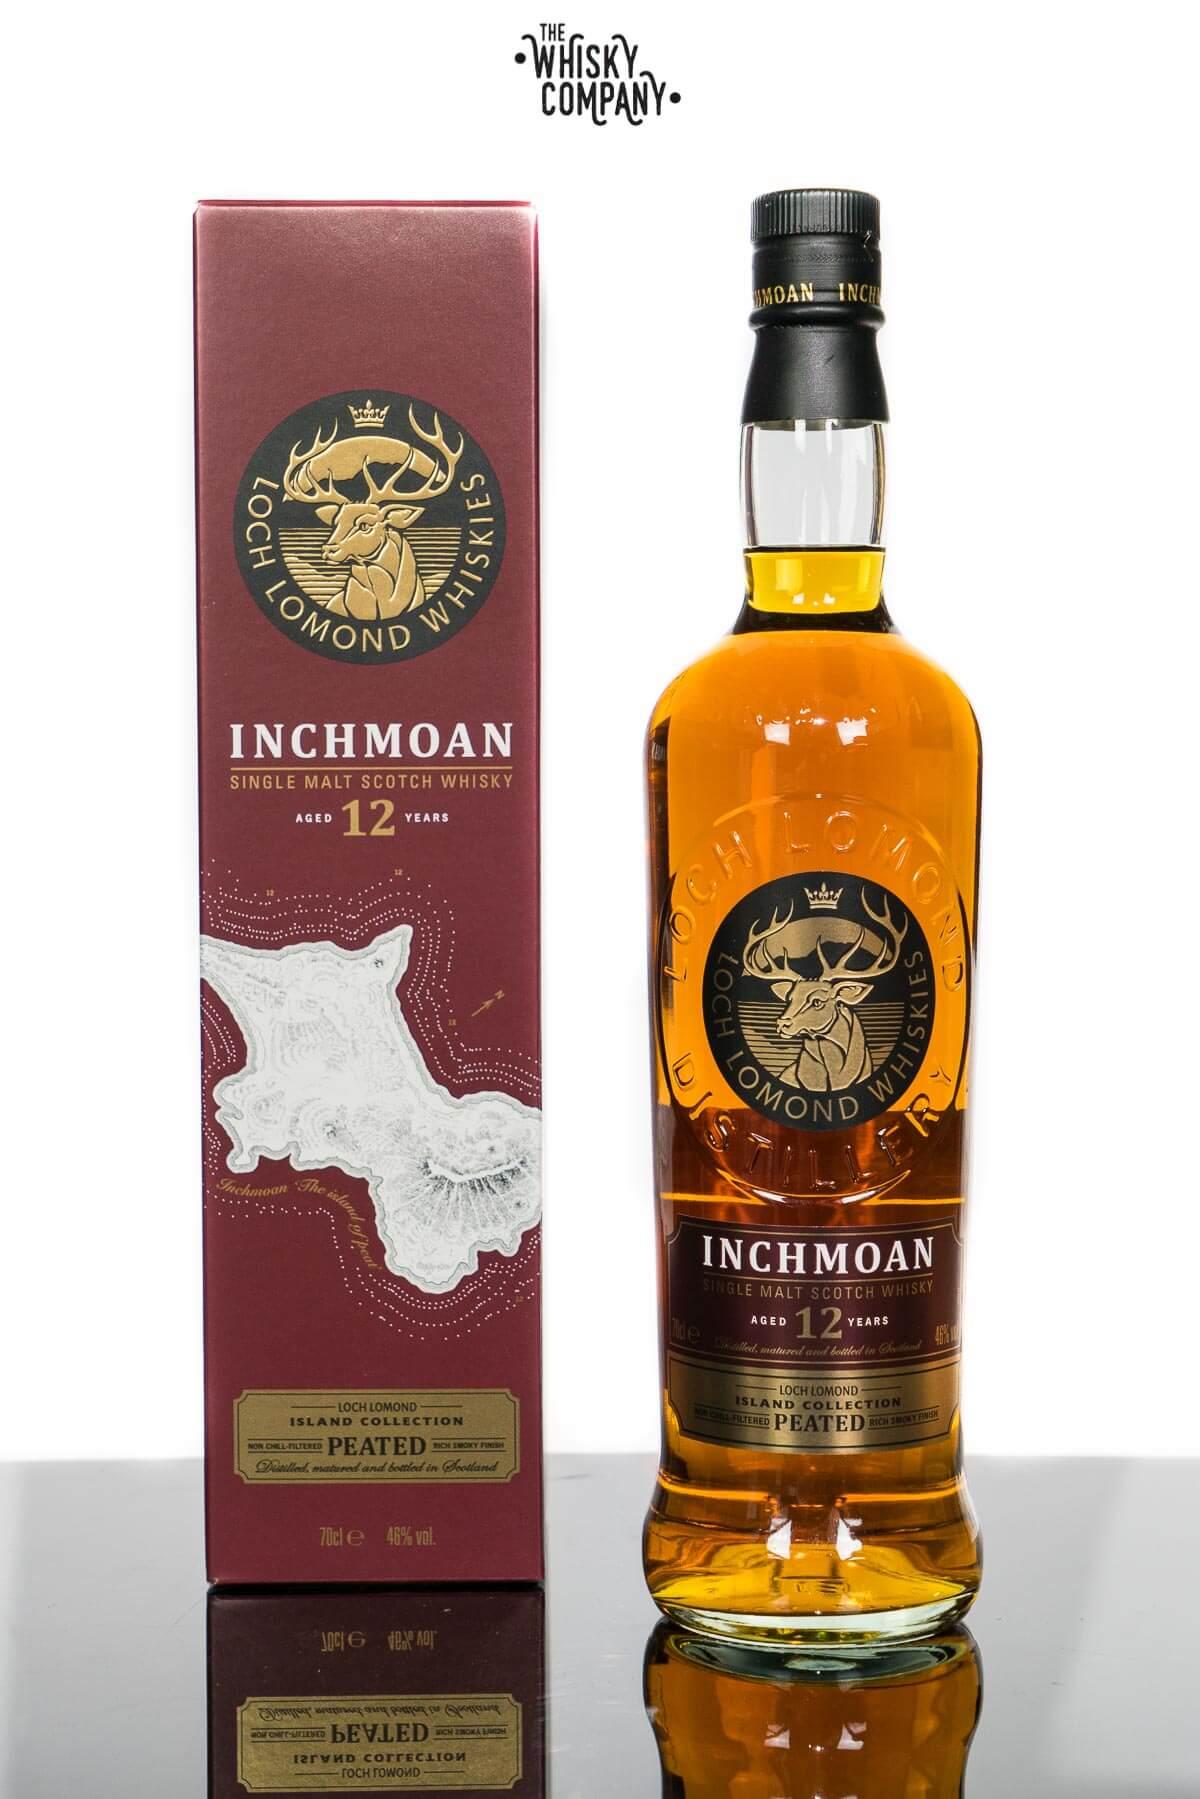 Inchmoan Aged 12 Years Highland Single Malt Scotch Whisky (700ml)